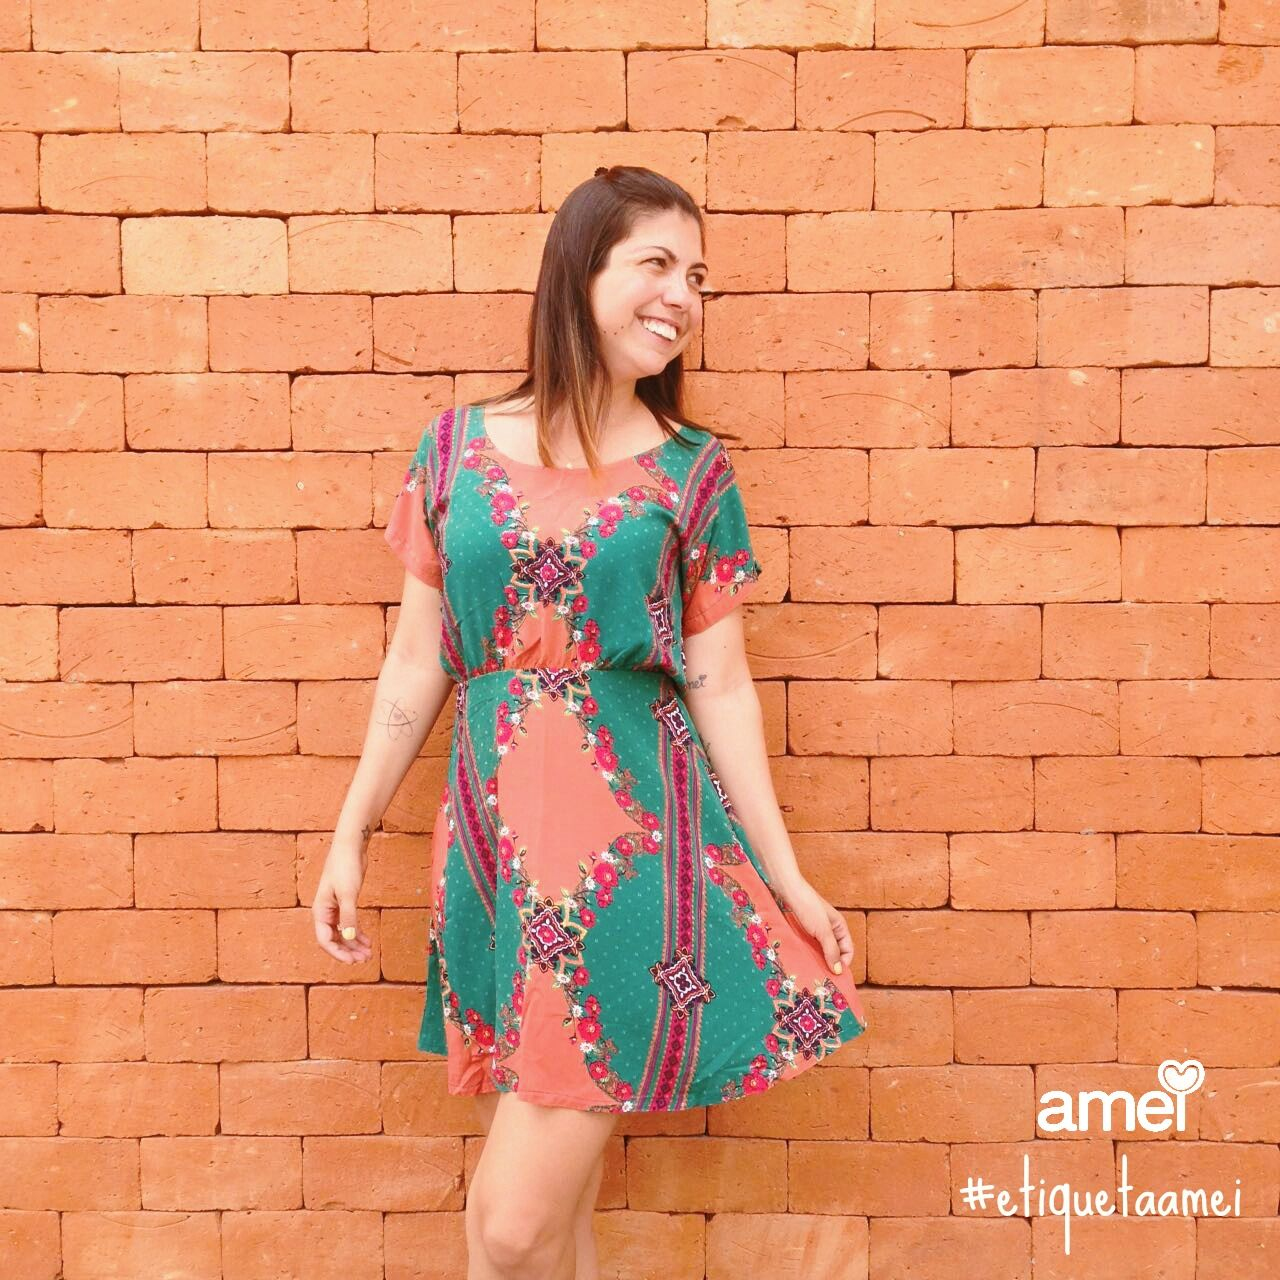 Toda semana esta entrando as novidades da #etiquetaamei ❤ #lojaamei #vestido #estampado #verde #lindo #novidade